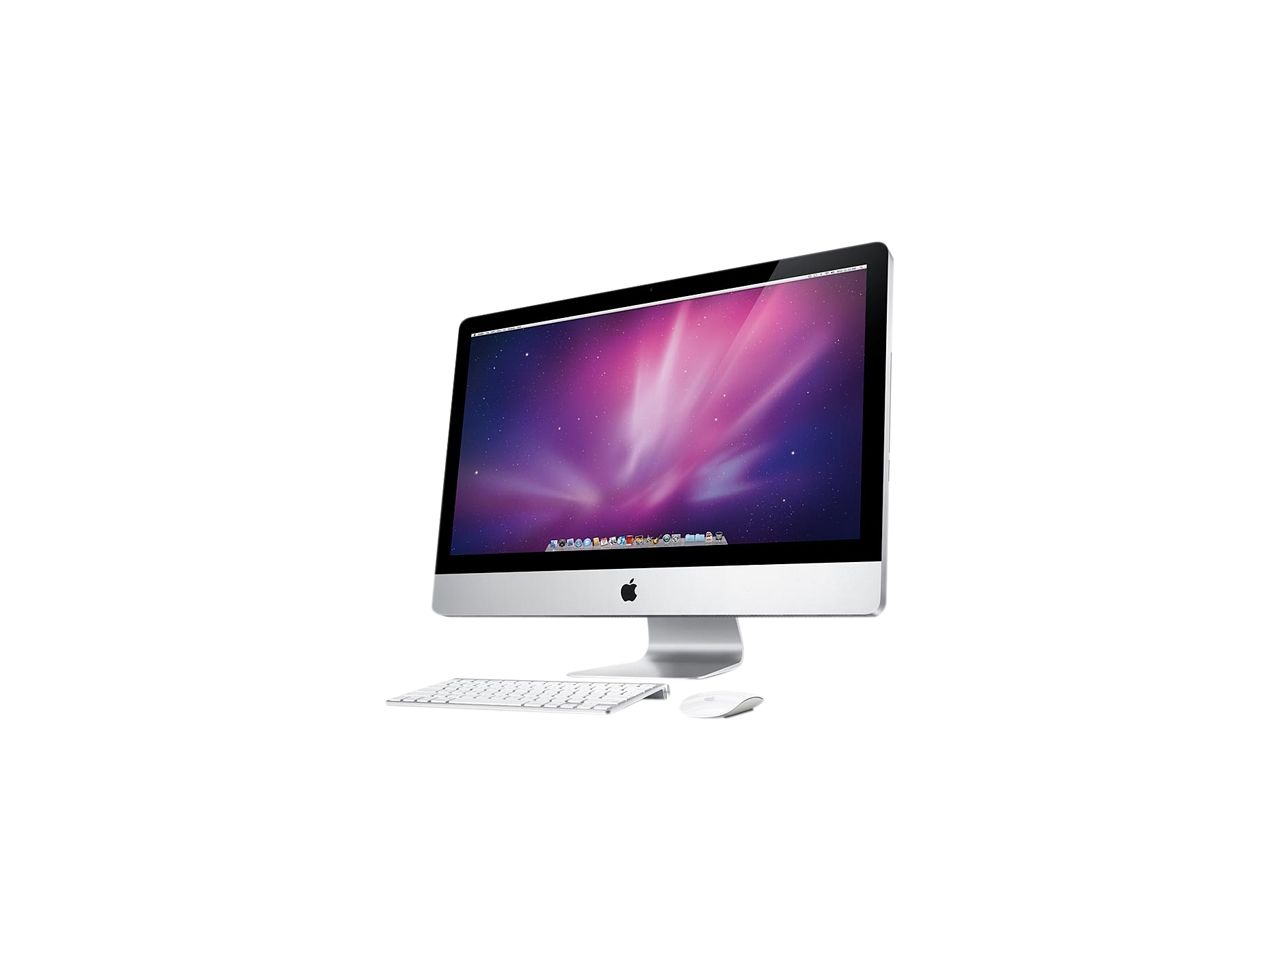 Refurbished Apple Desktop Pc Imac Mc510ll A R Intel Core I3 3 2 Ghz 4 Gb Ddr3 1 Tb Hdd Mac Os X V10 6 Snow Leopard Newegg Co Imac Apple Desktop Imac Desktop